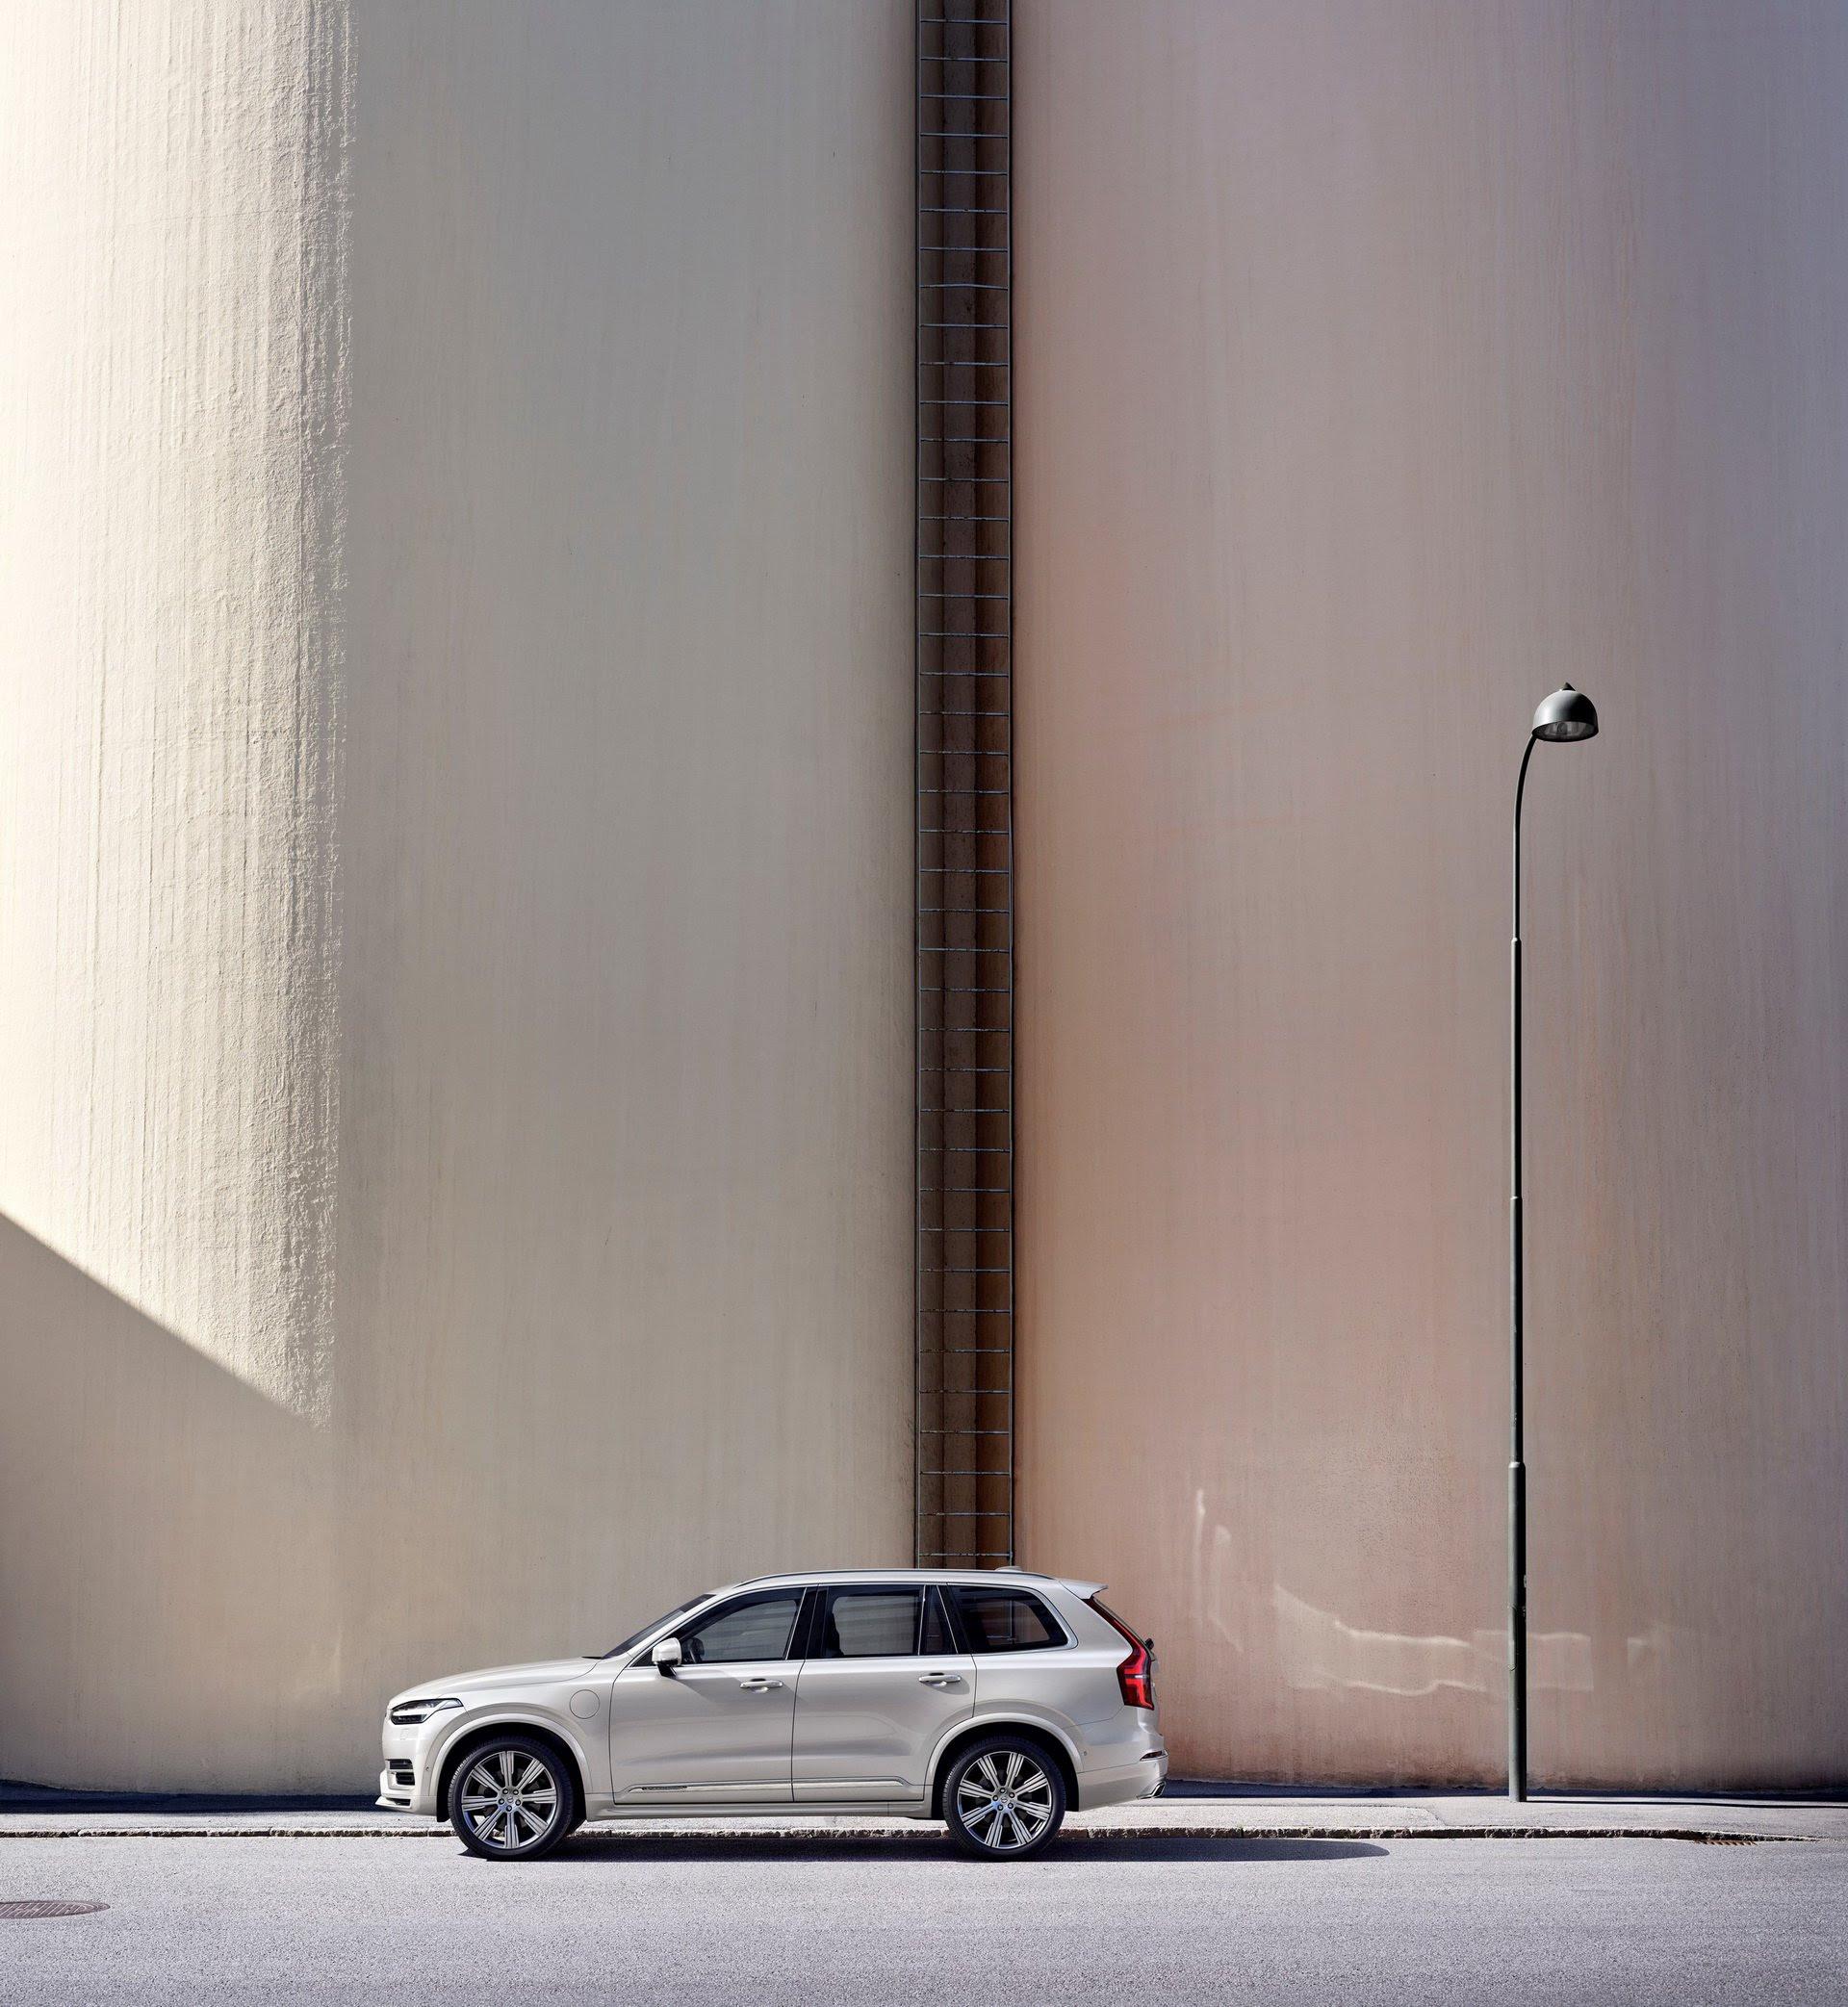 2020 Volvo Xc90 Inscription T8 Plug In Hybrid Color Birch Light Images, Photos, Reviews